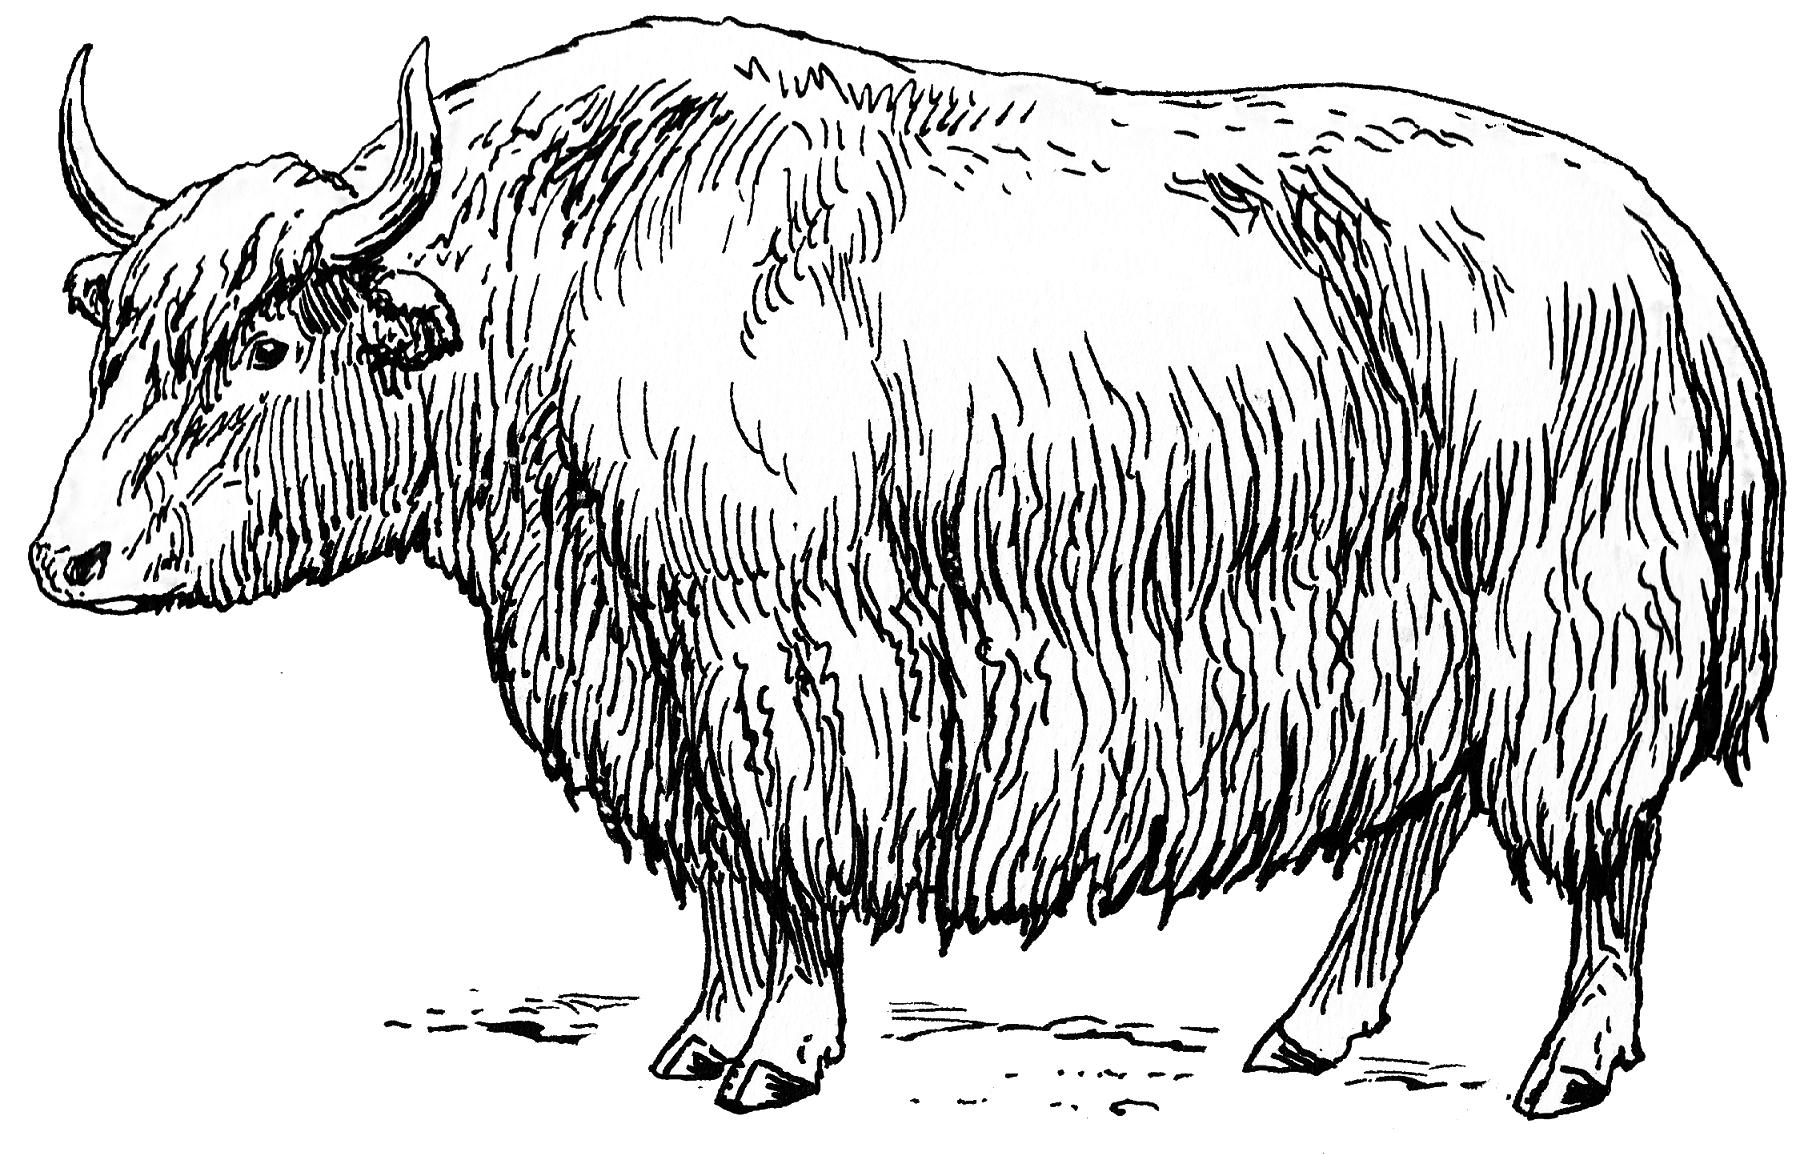 картинка овцебыка распечатать описание характеристика